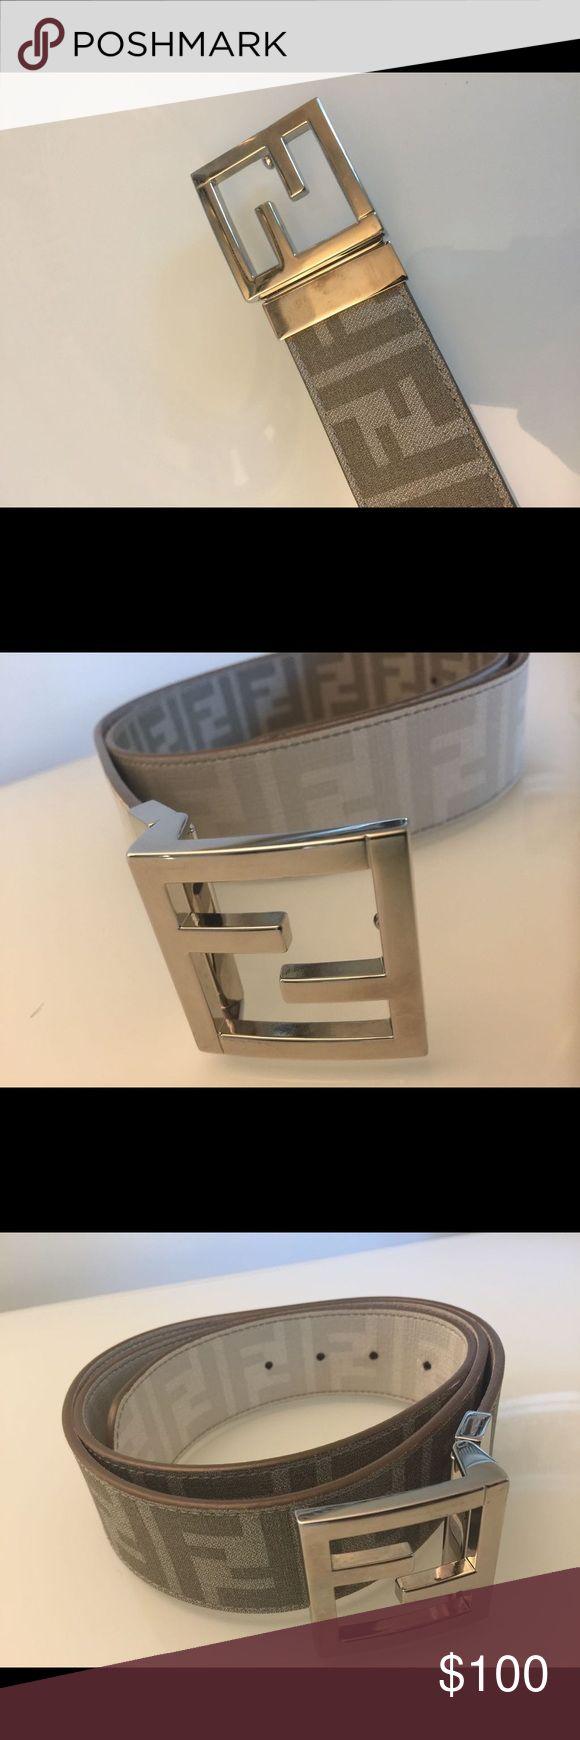 Fendi Belt Women Belt Fendi Accessories Belts